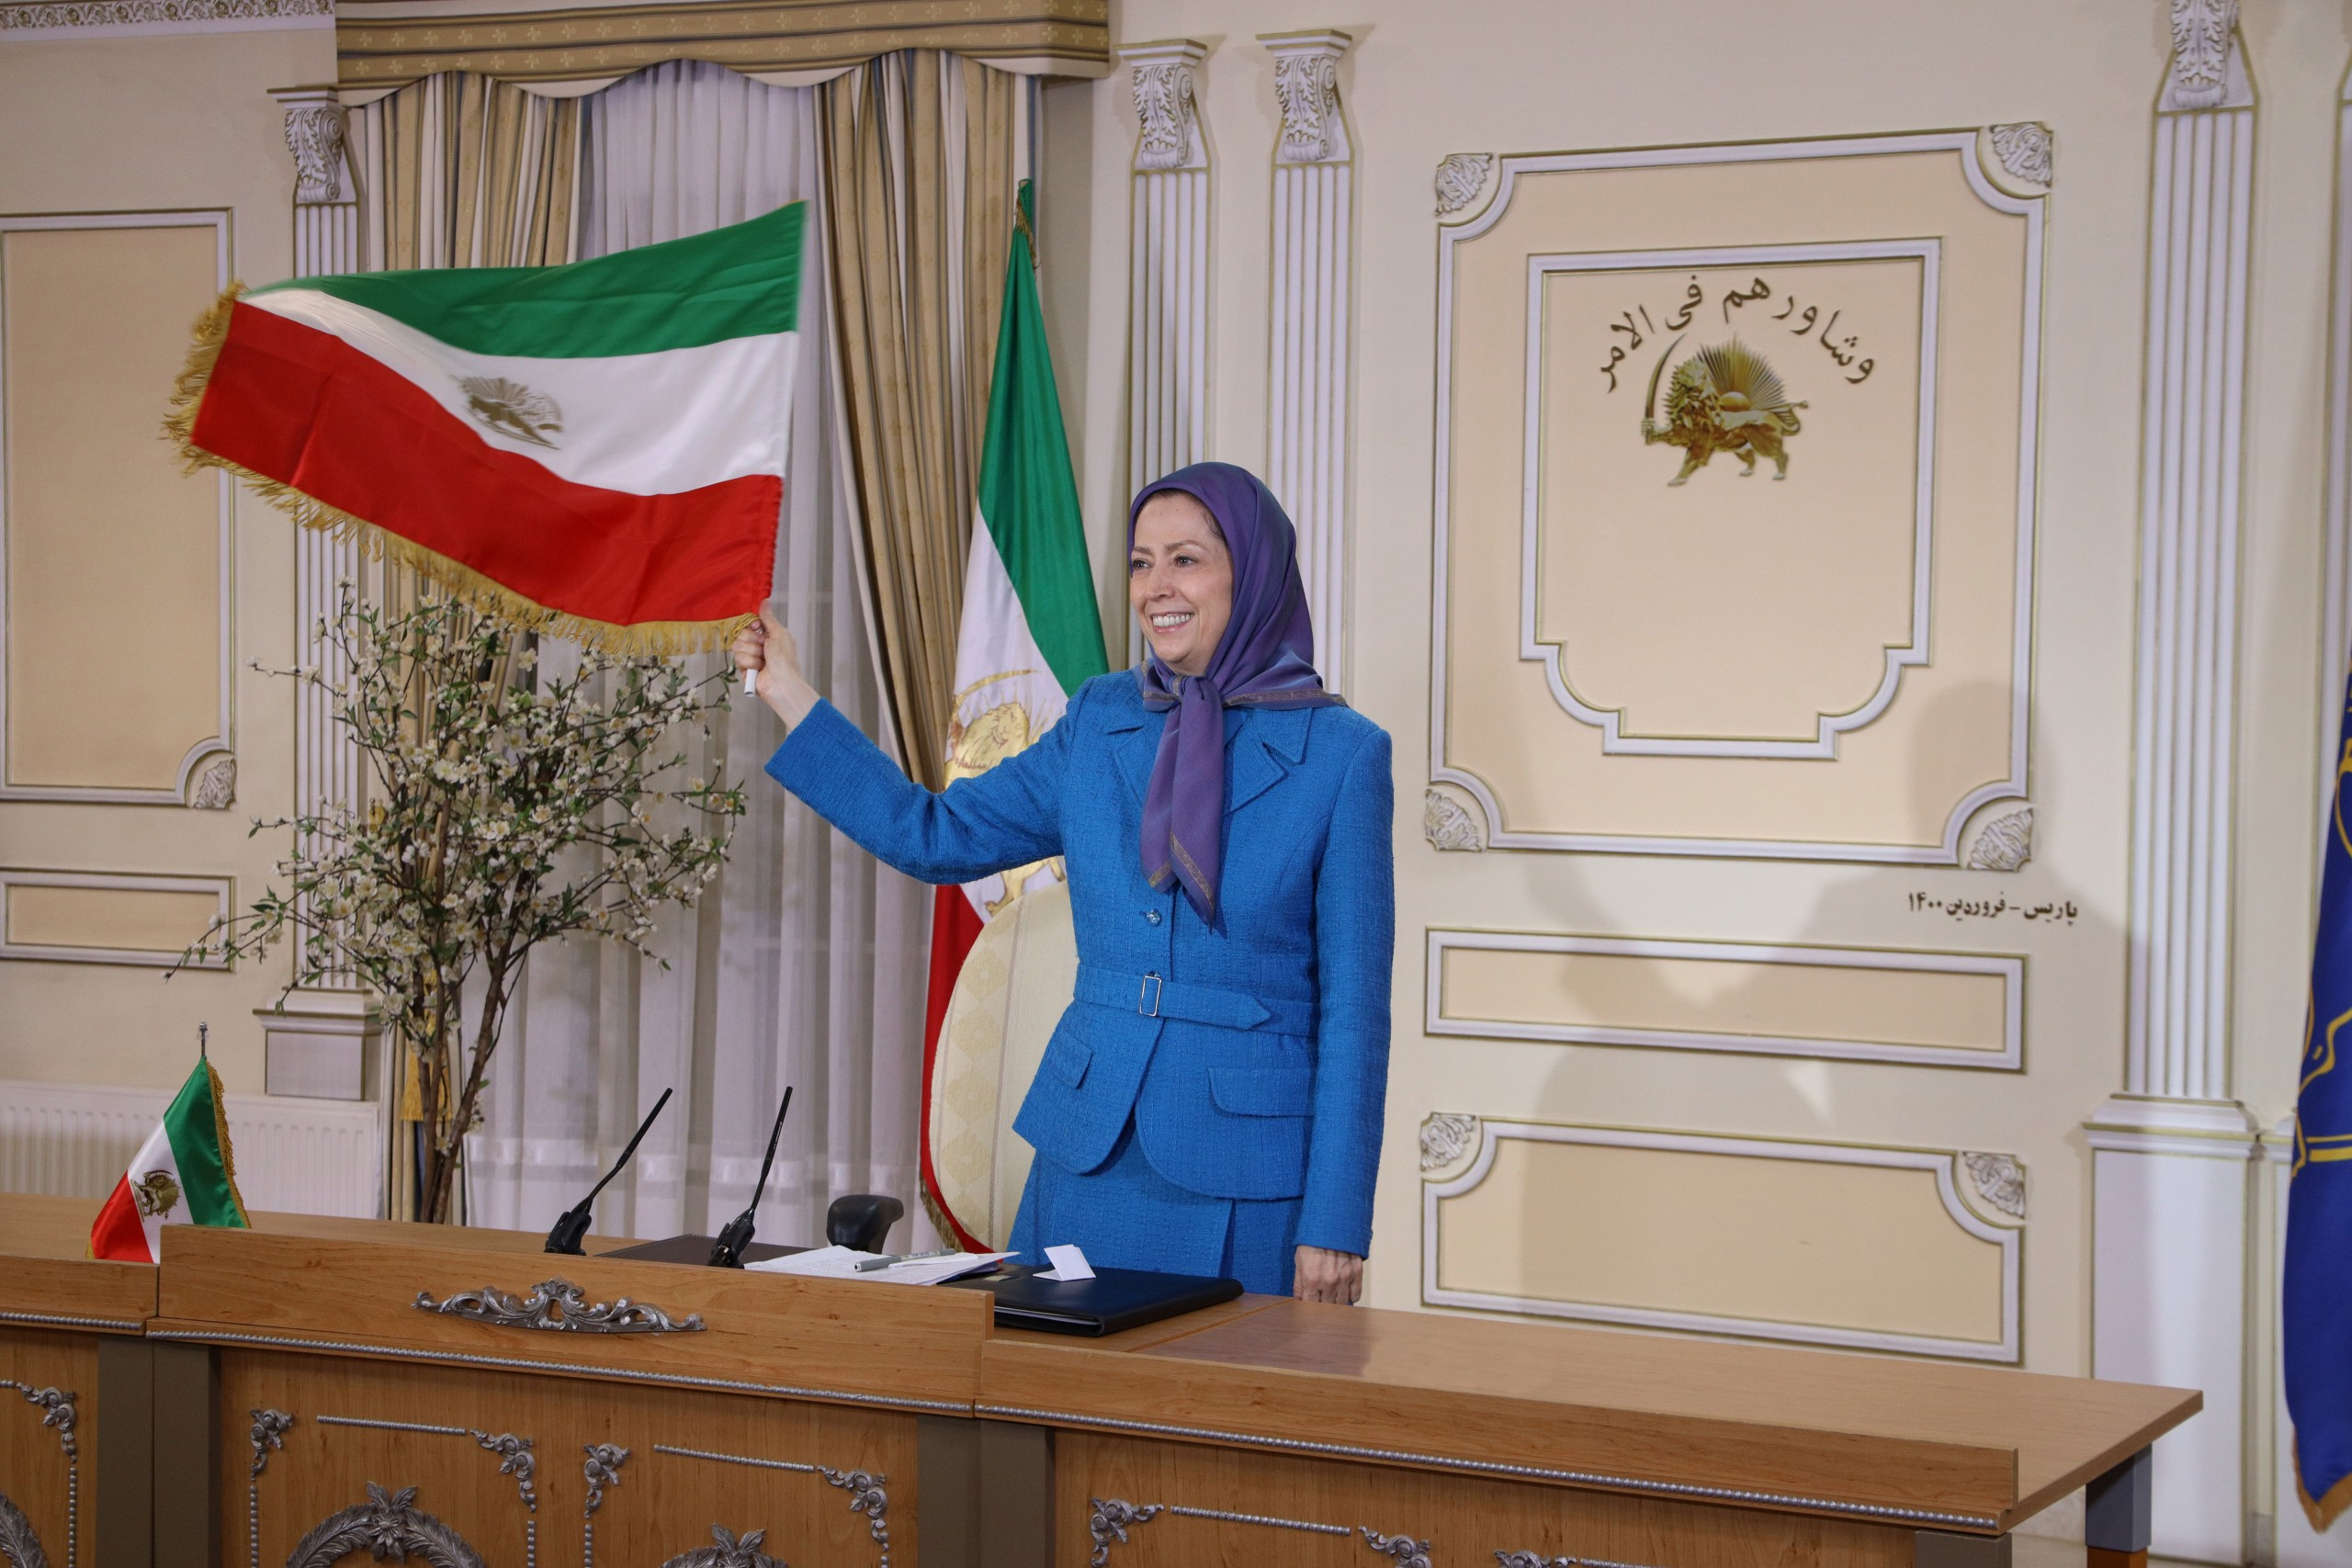 Maryam Rajavi: Revolutionary circumstances exist in Iranian society as the sole democratic alternative shines ever brighter